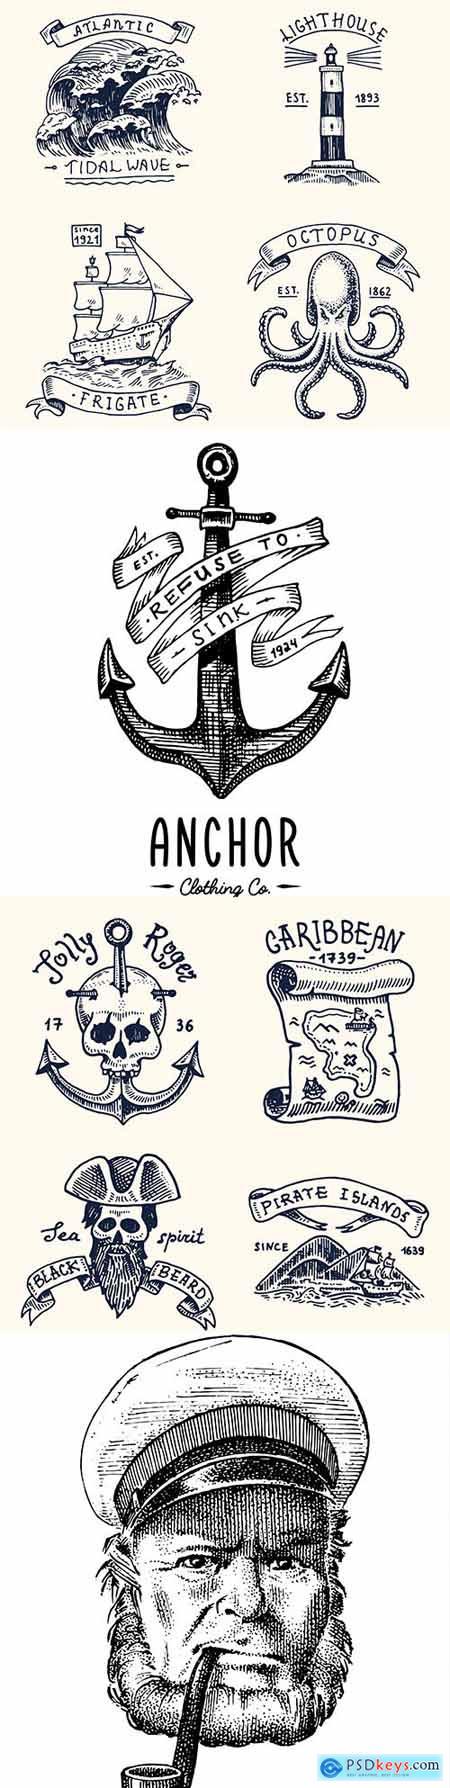 Marine elements engraved vintage stickers and badges design